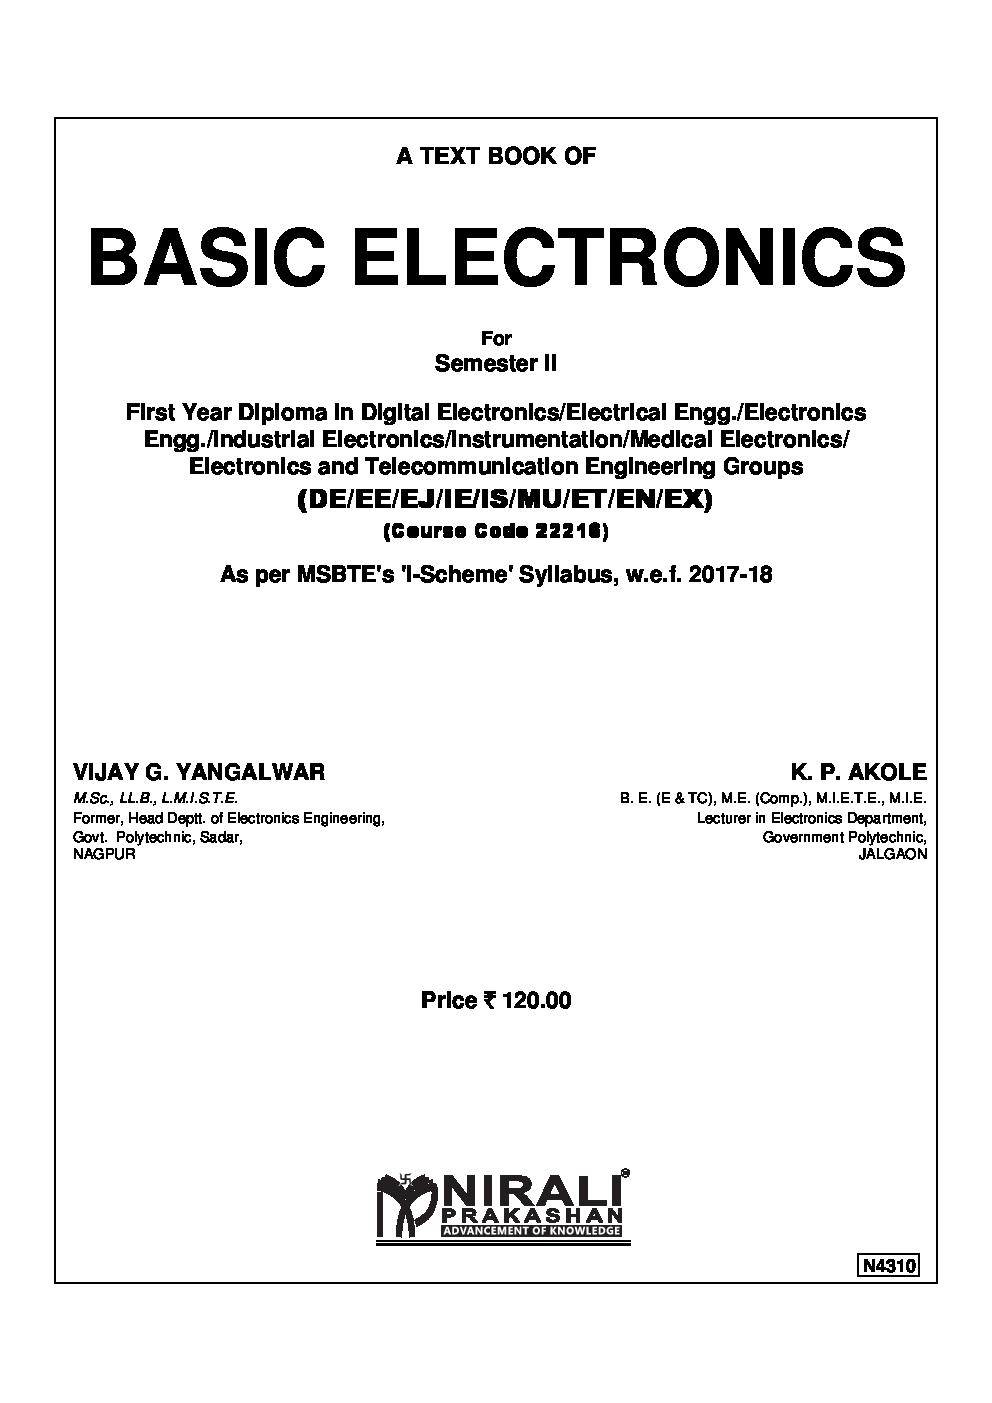 Download Basic Electronics By Vijay G Yangalwar K P Akole Pdf Online